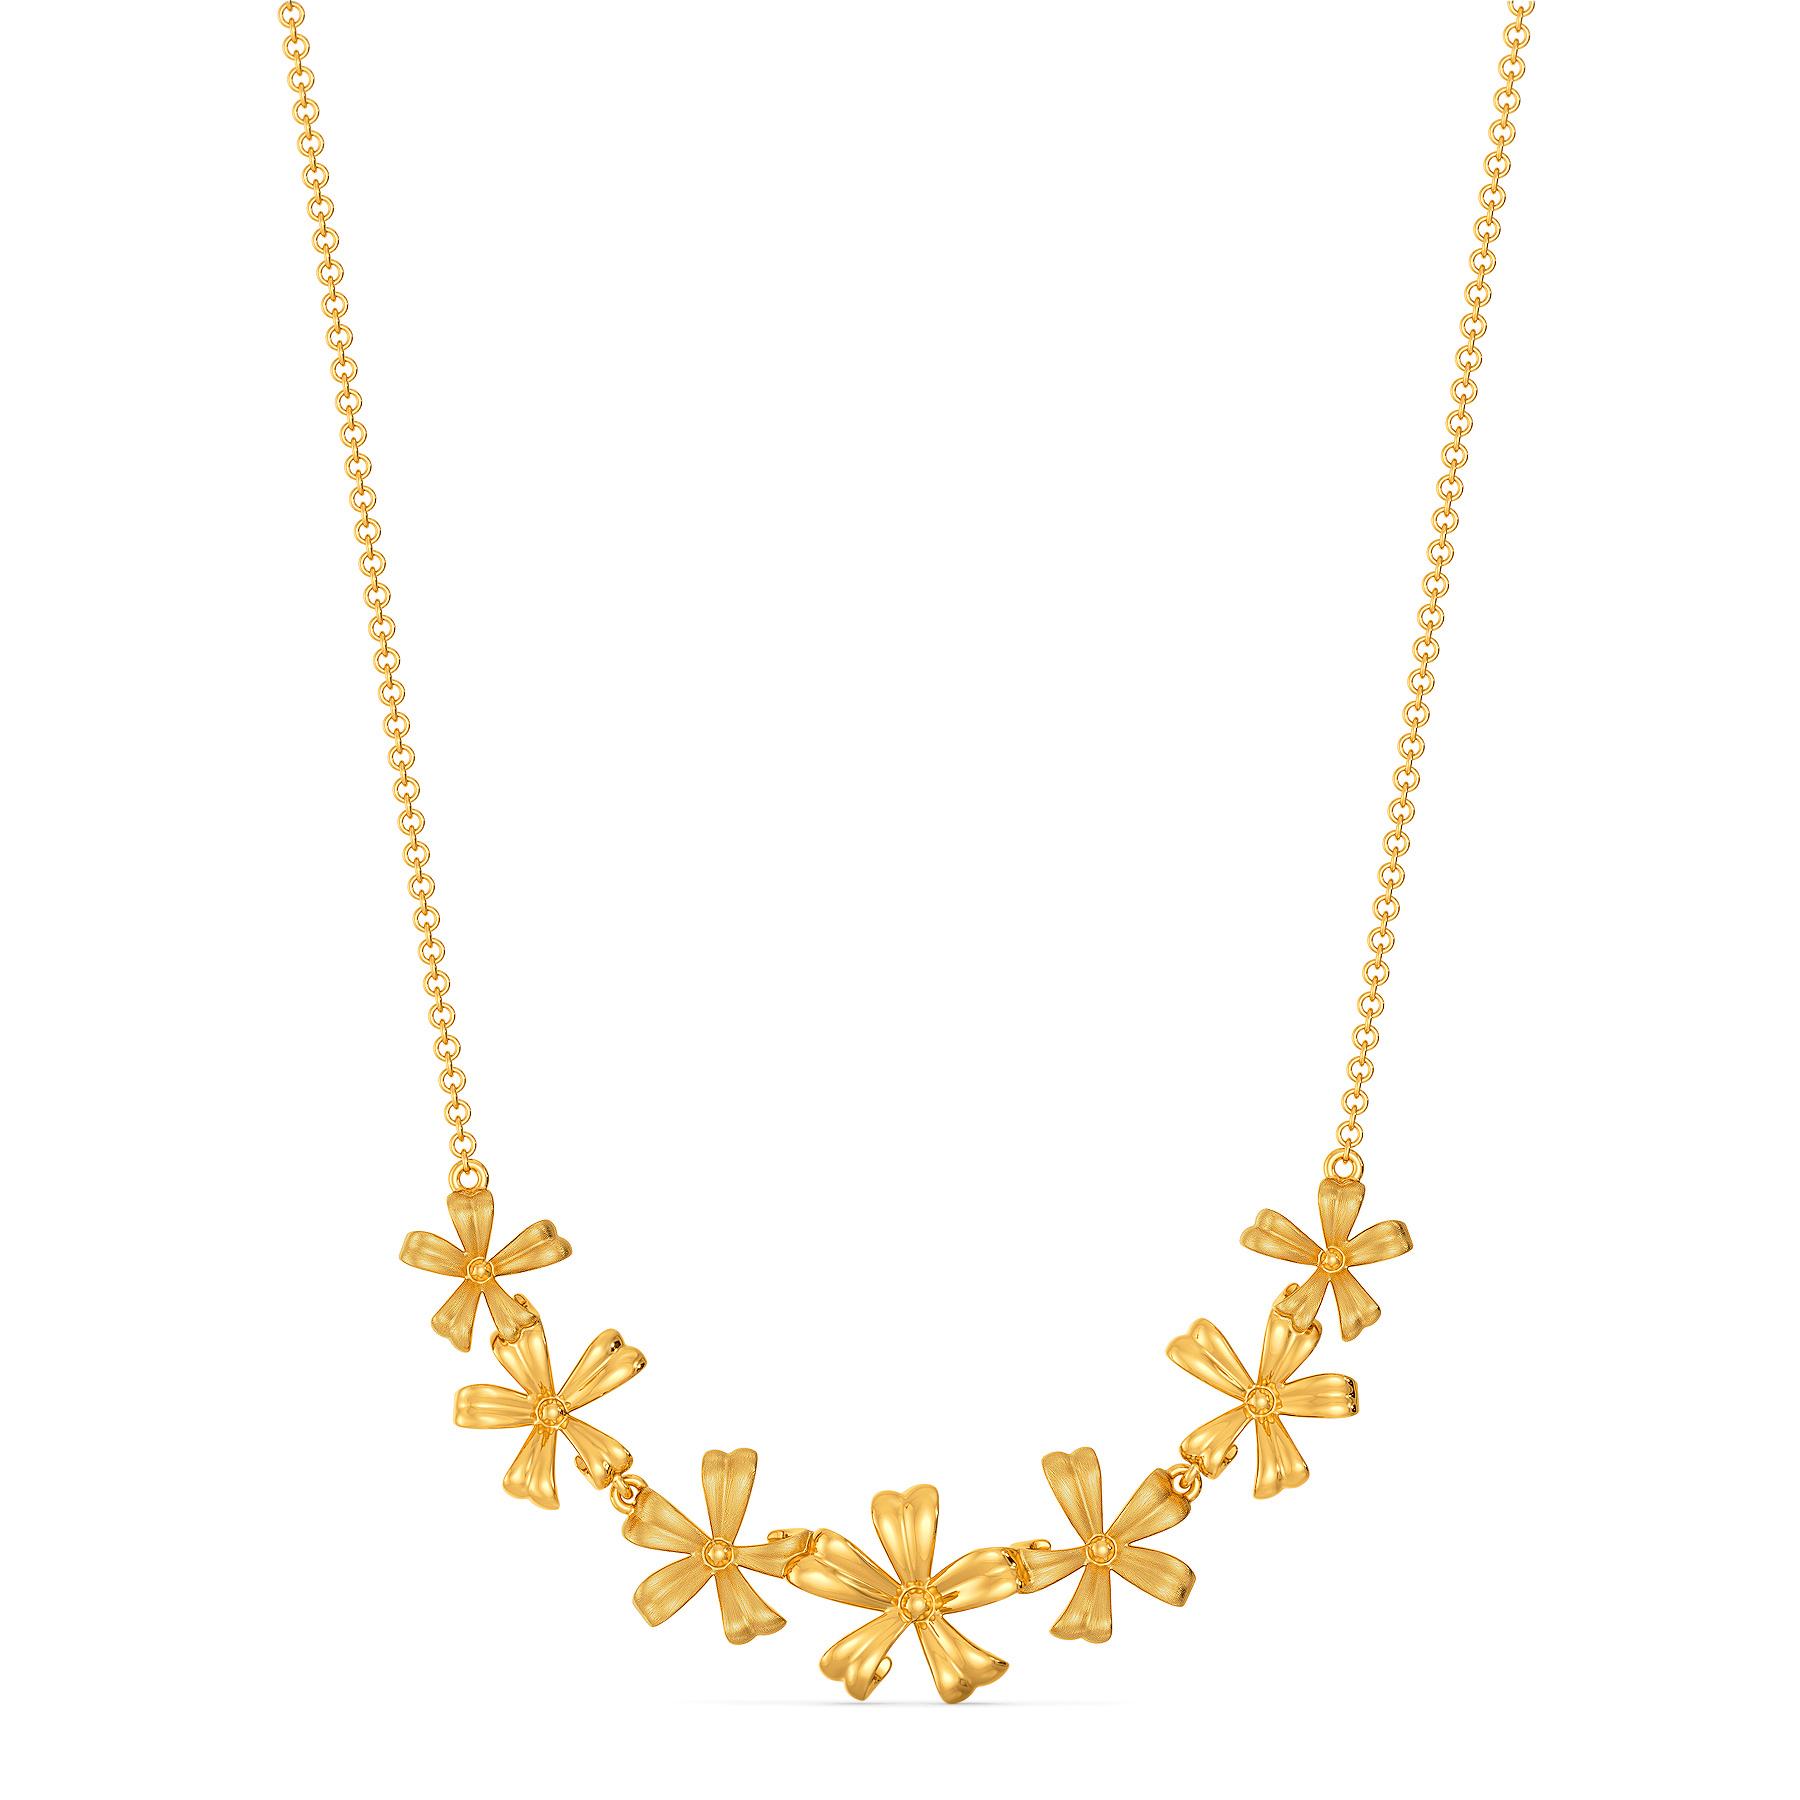 Flower Fantasy Gold Necklaces